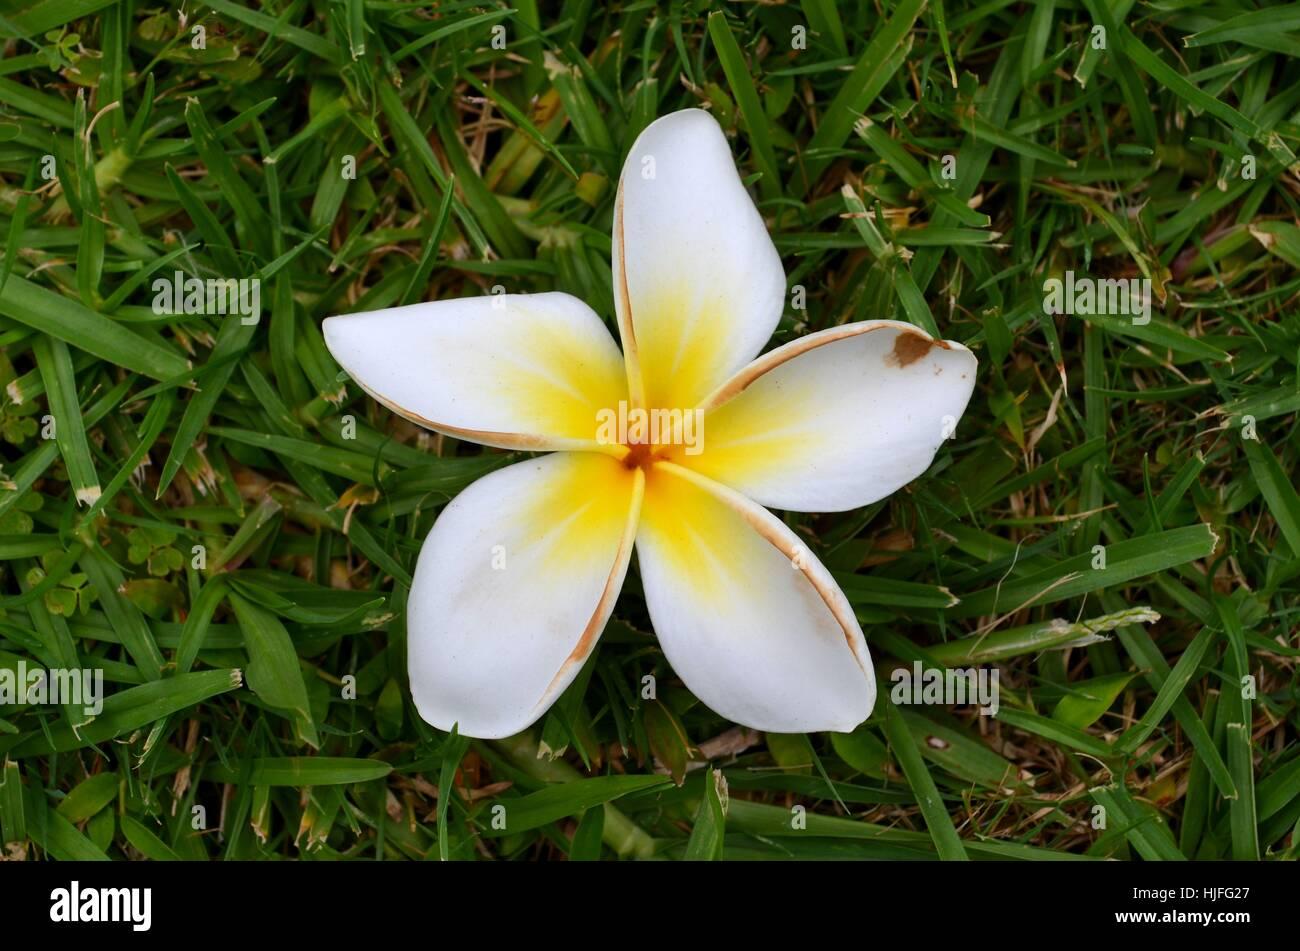 Frangipani flower fallen to the ground - Stock Image